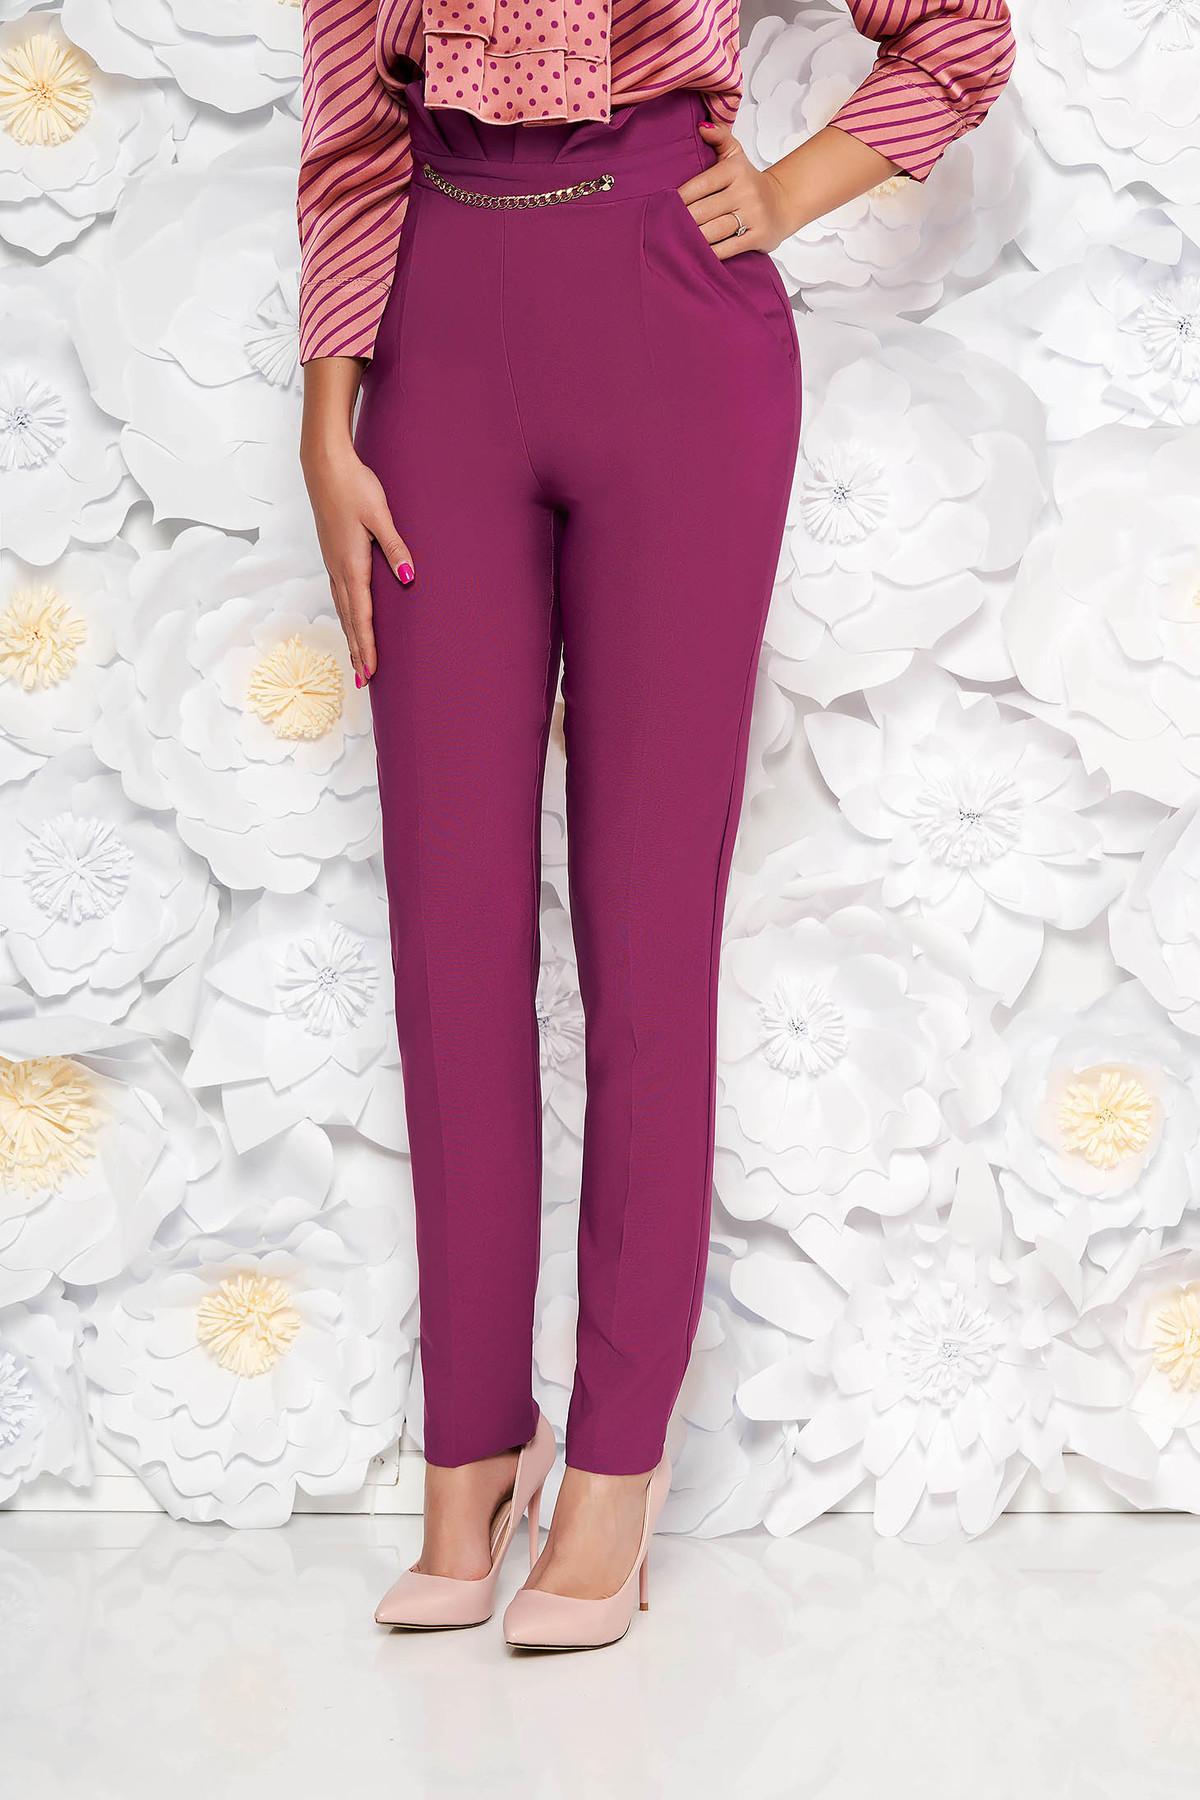 Pantaloni PrettyGirl mov eleganti cu talie inalta din stofa usor elastica cu aplicatii metalice aurii